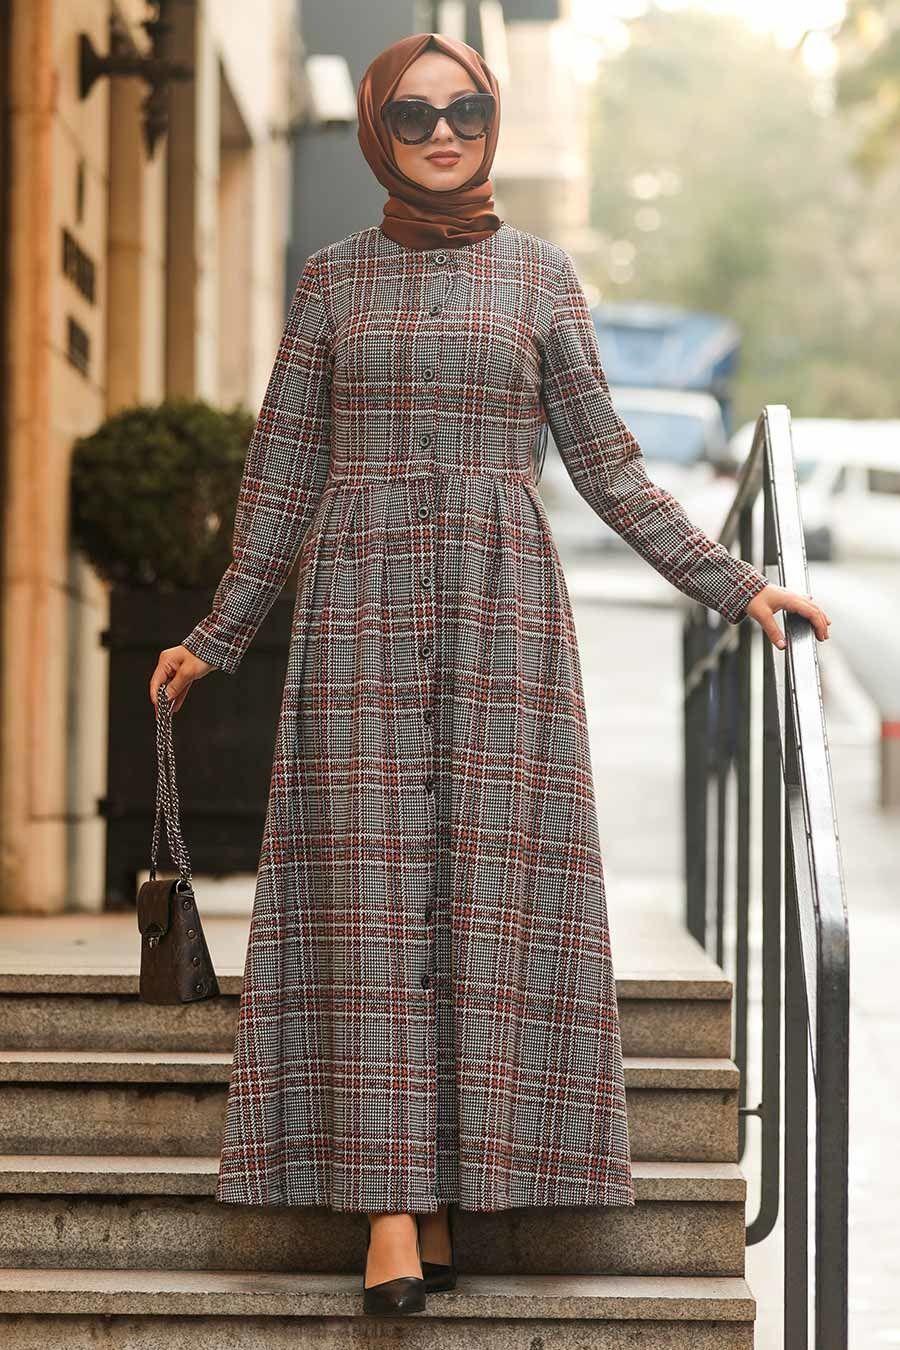 Neva Style Ekoseli Kiremit Tesettur Elbise 75901krmt Tesetturisland Com Elbise Kiyafet Nevada